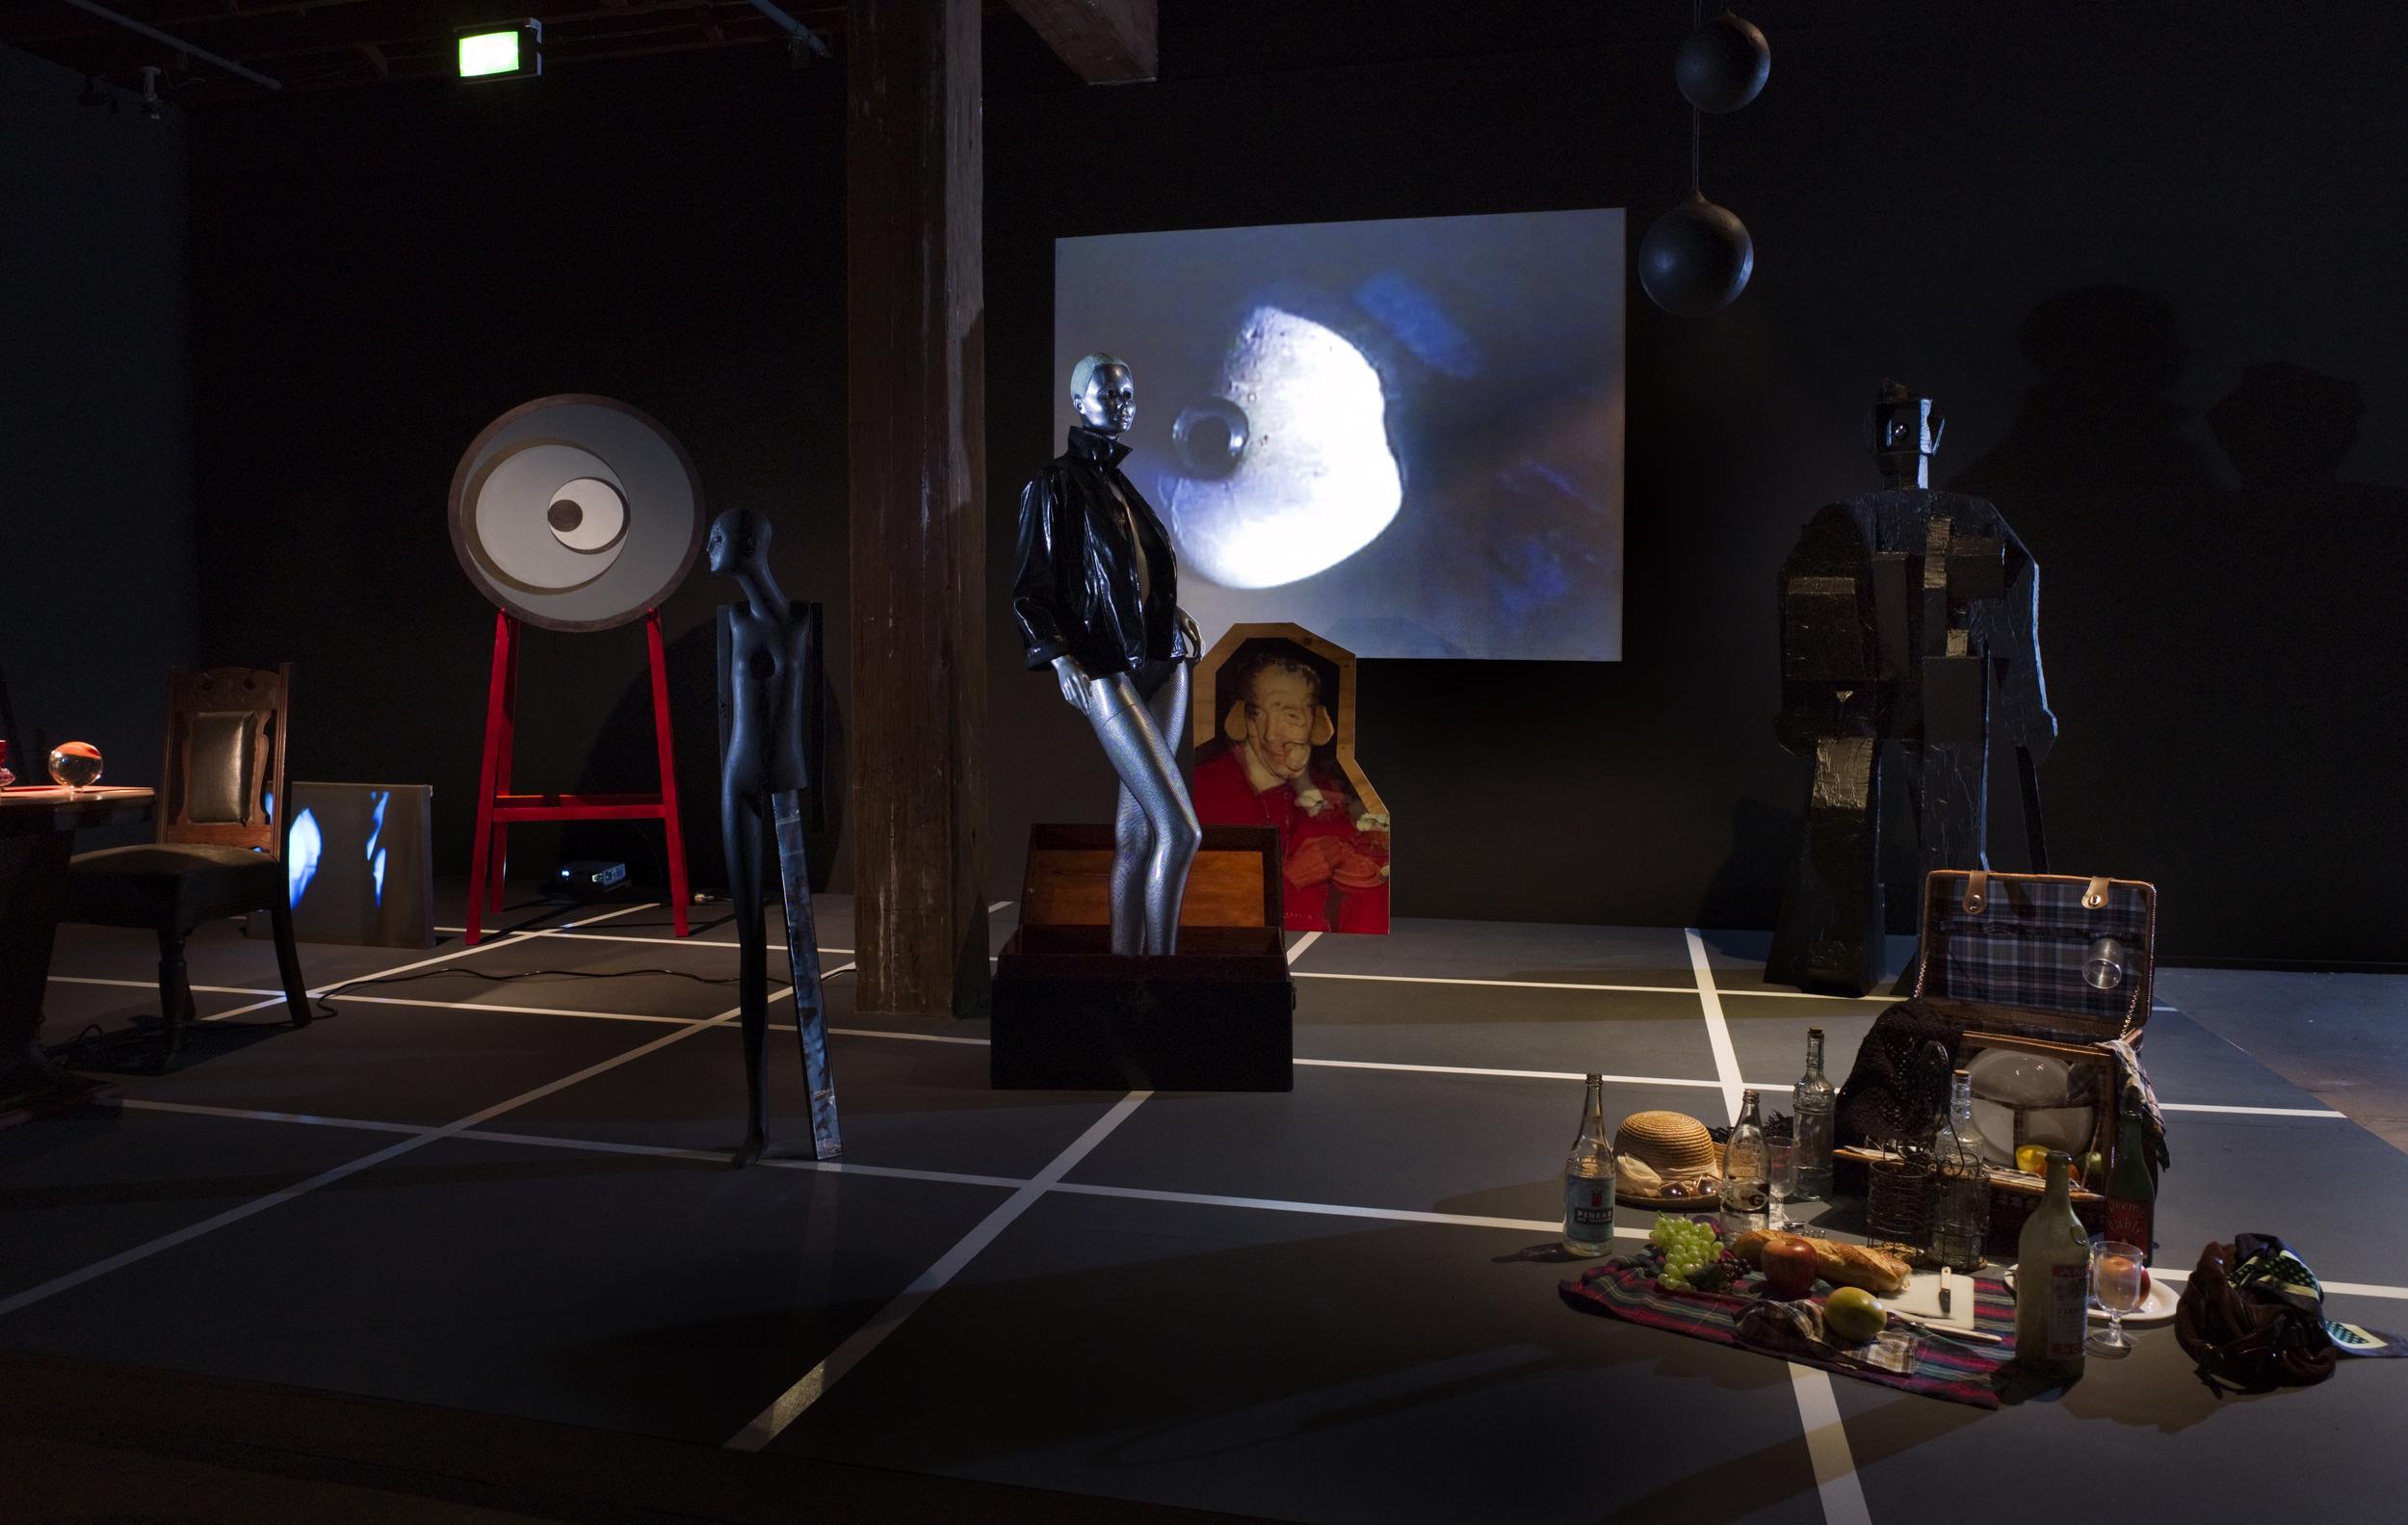 Tony Marin, Melbourne, Photographer, Artist, Damiano Bertoli, installation